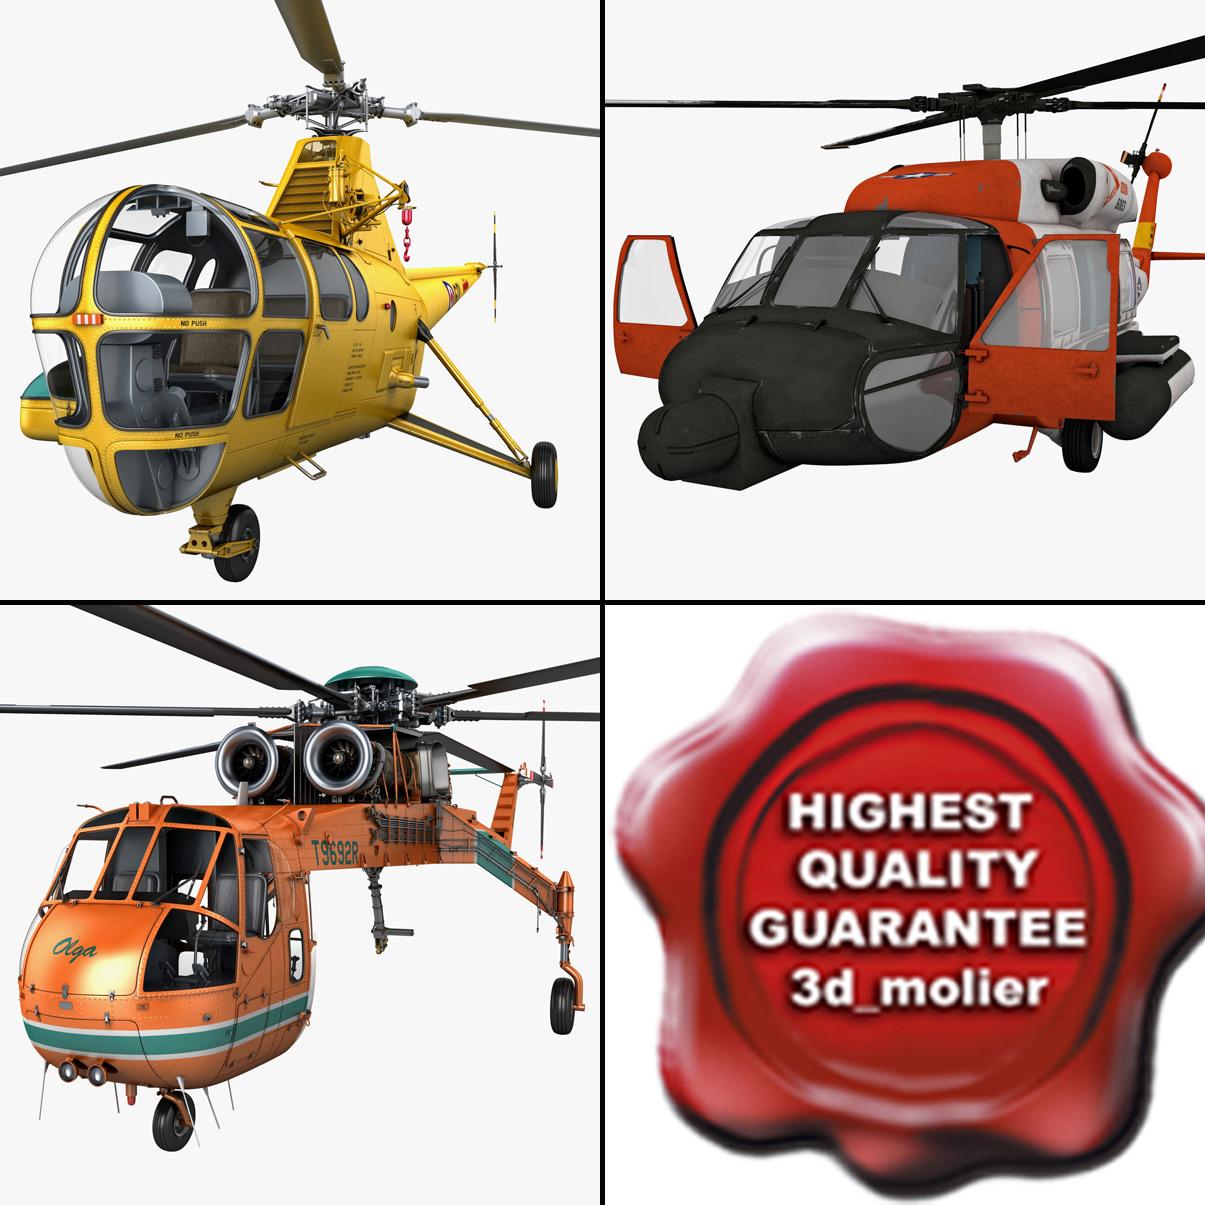 sikorsky aircraft skycrane helicopter 3d model